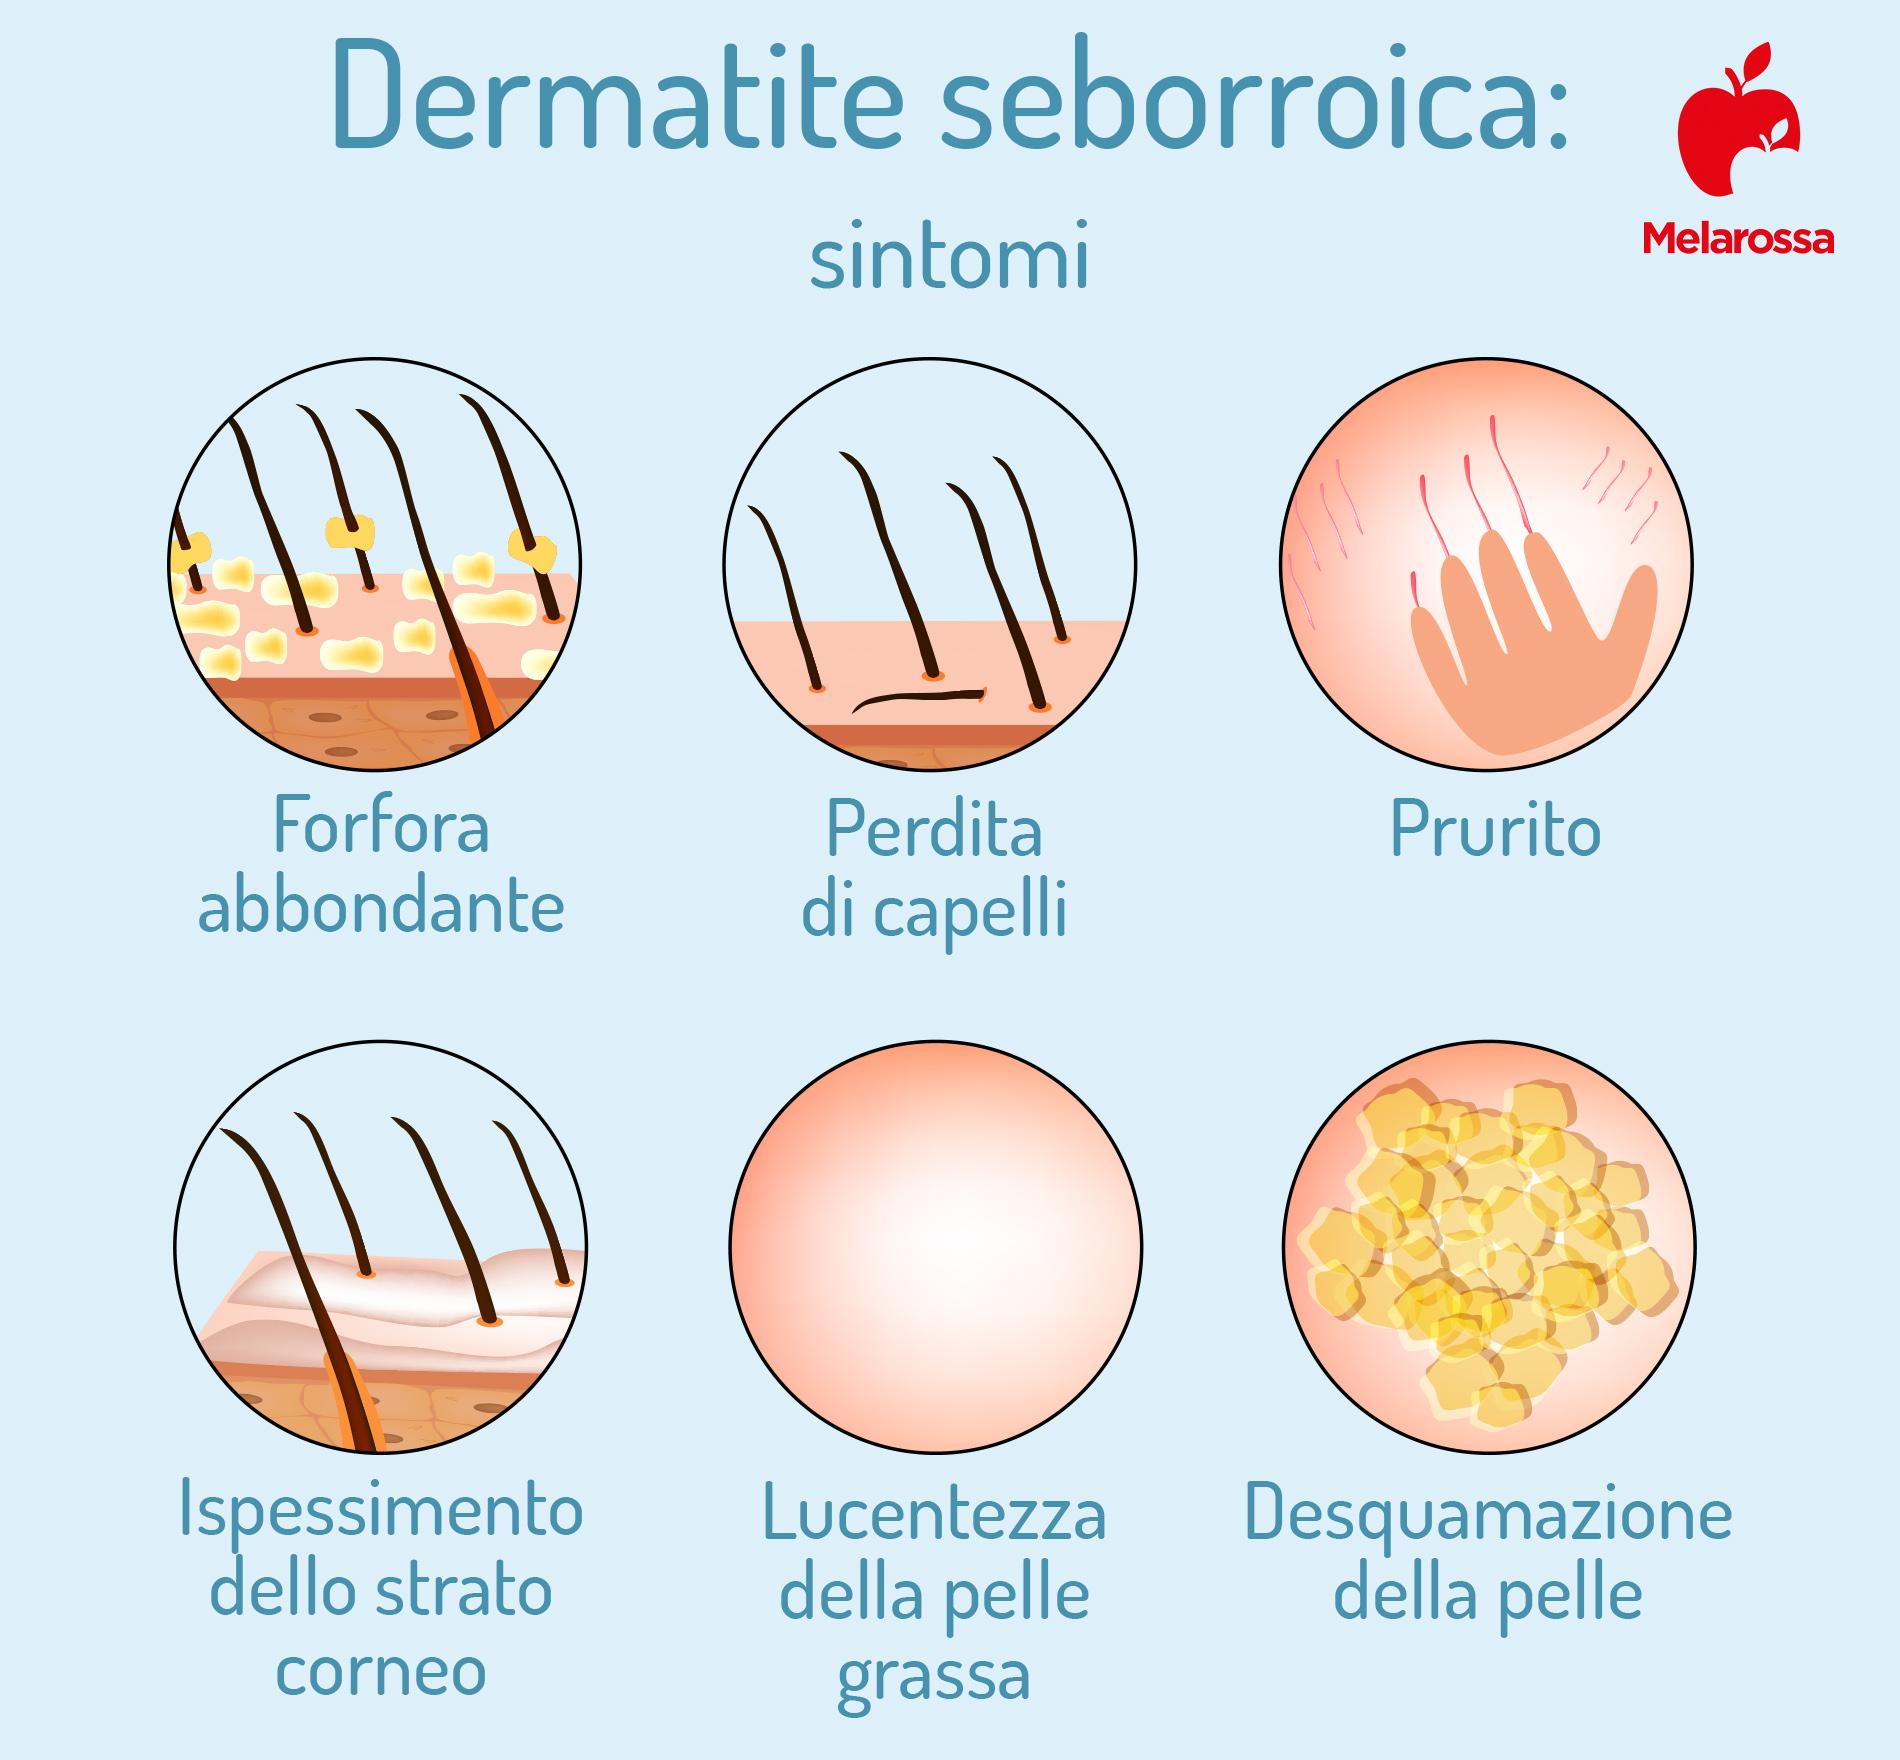 dermatite seborroica: sintomi